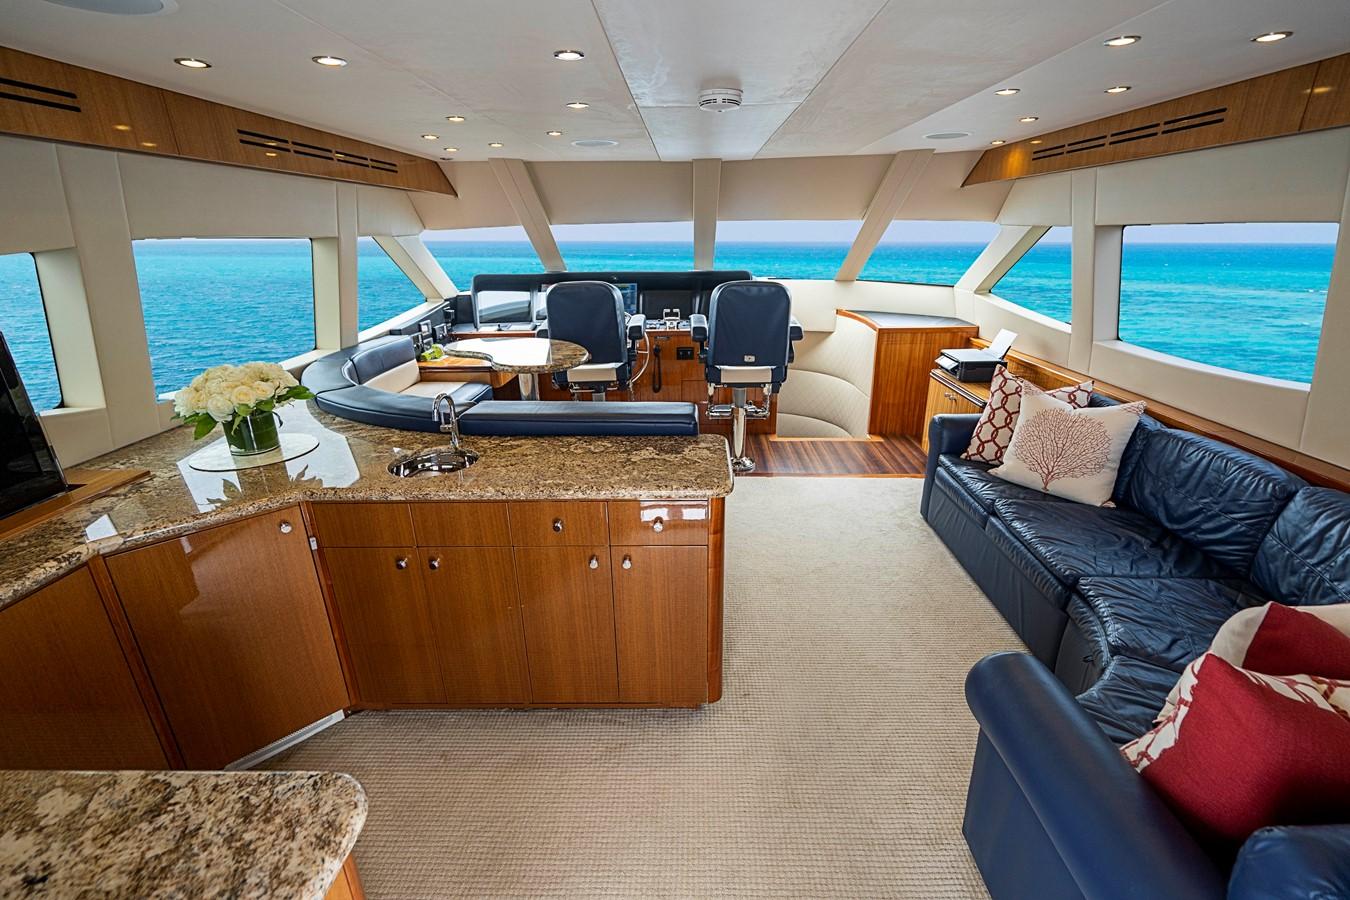 2011 HATTERAS Enclosed Bridge Motor Yacht 2678463